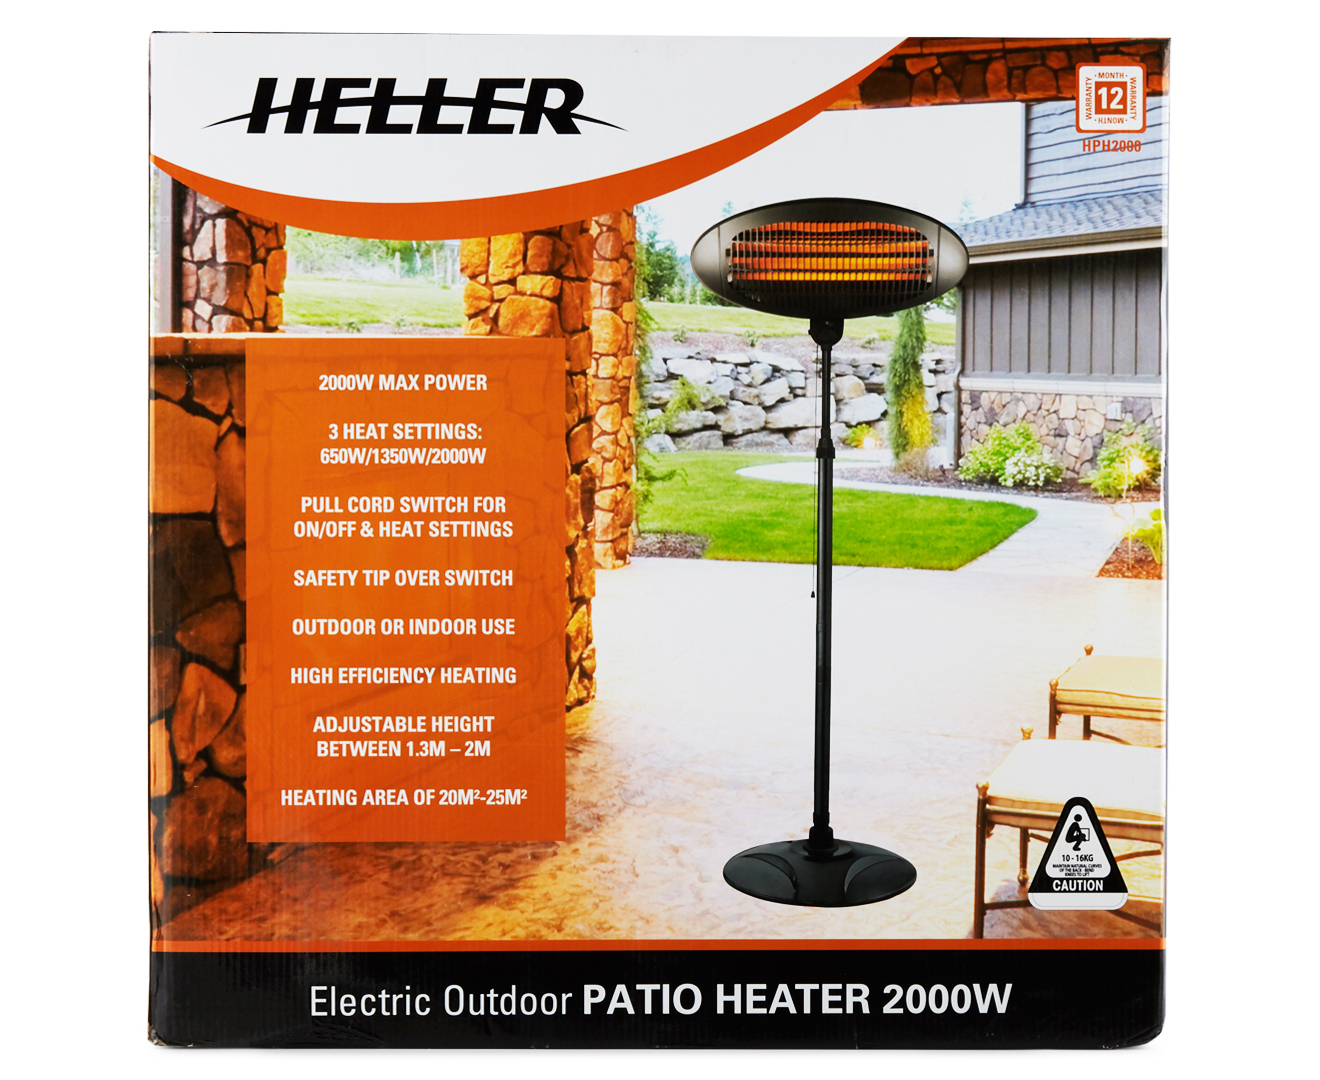 Heller 2000w Electric Outdoor Patio Heater Black Catch